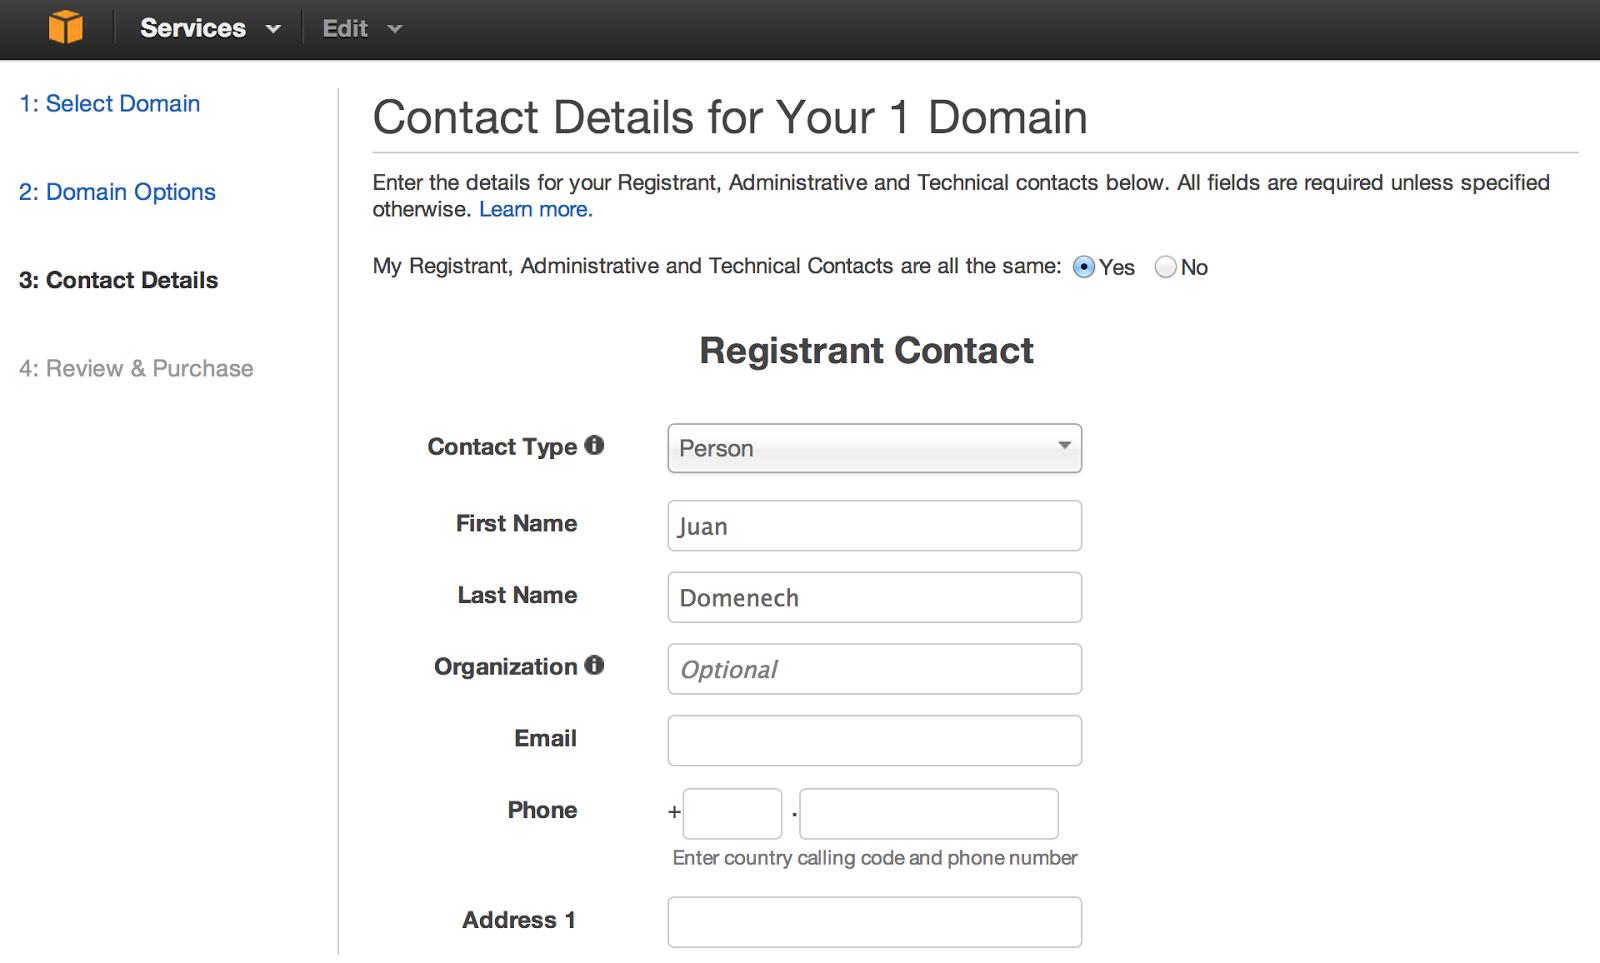 blog-domenech-org-transfer-internet-domain-to-aws-route-53-step-5